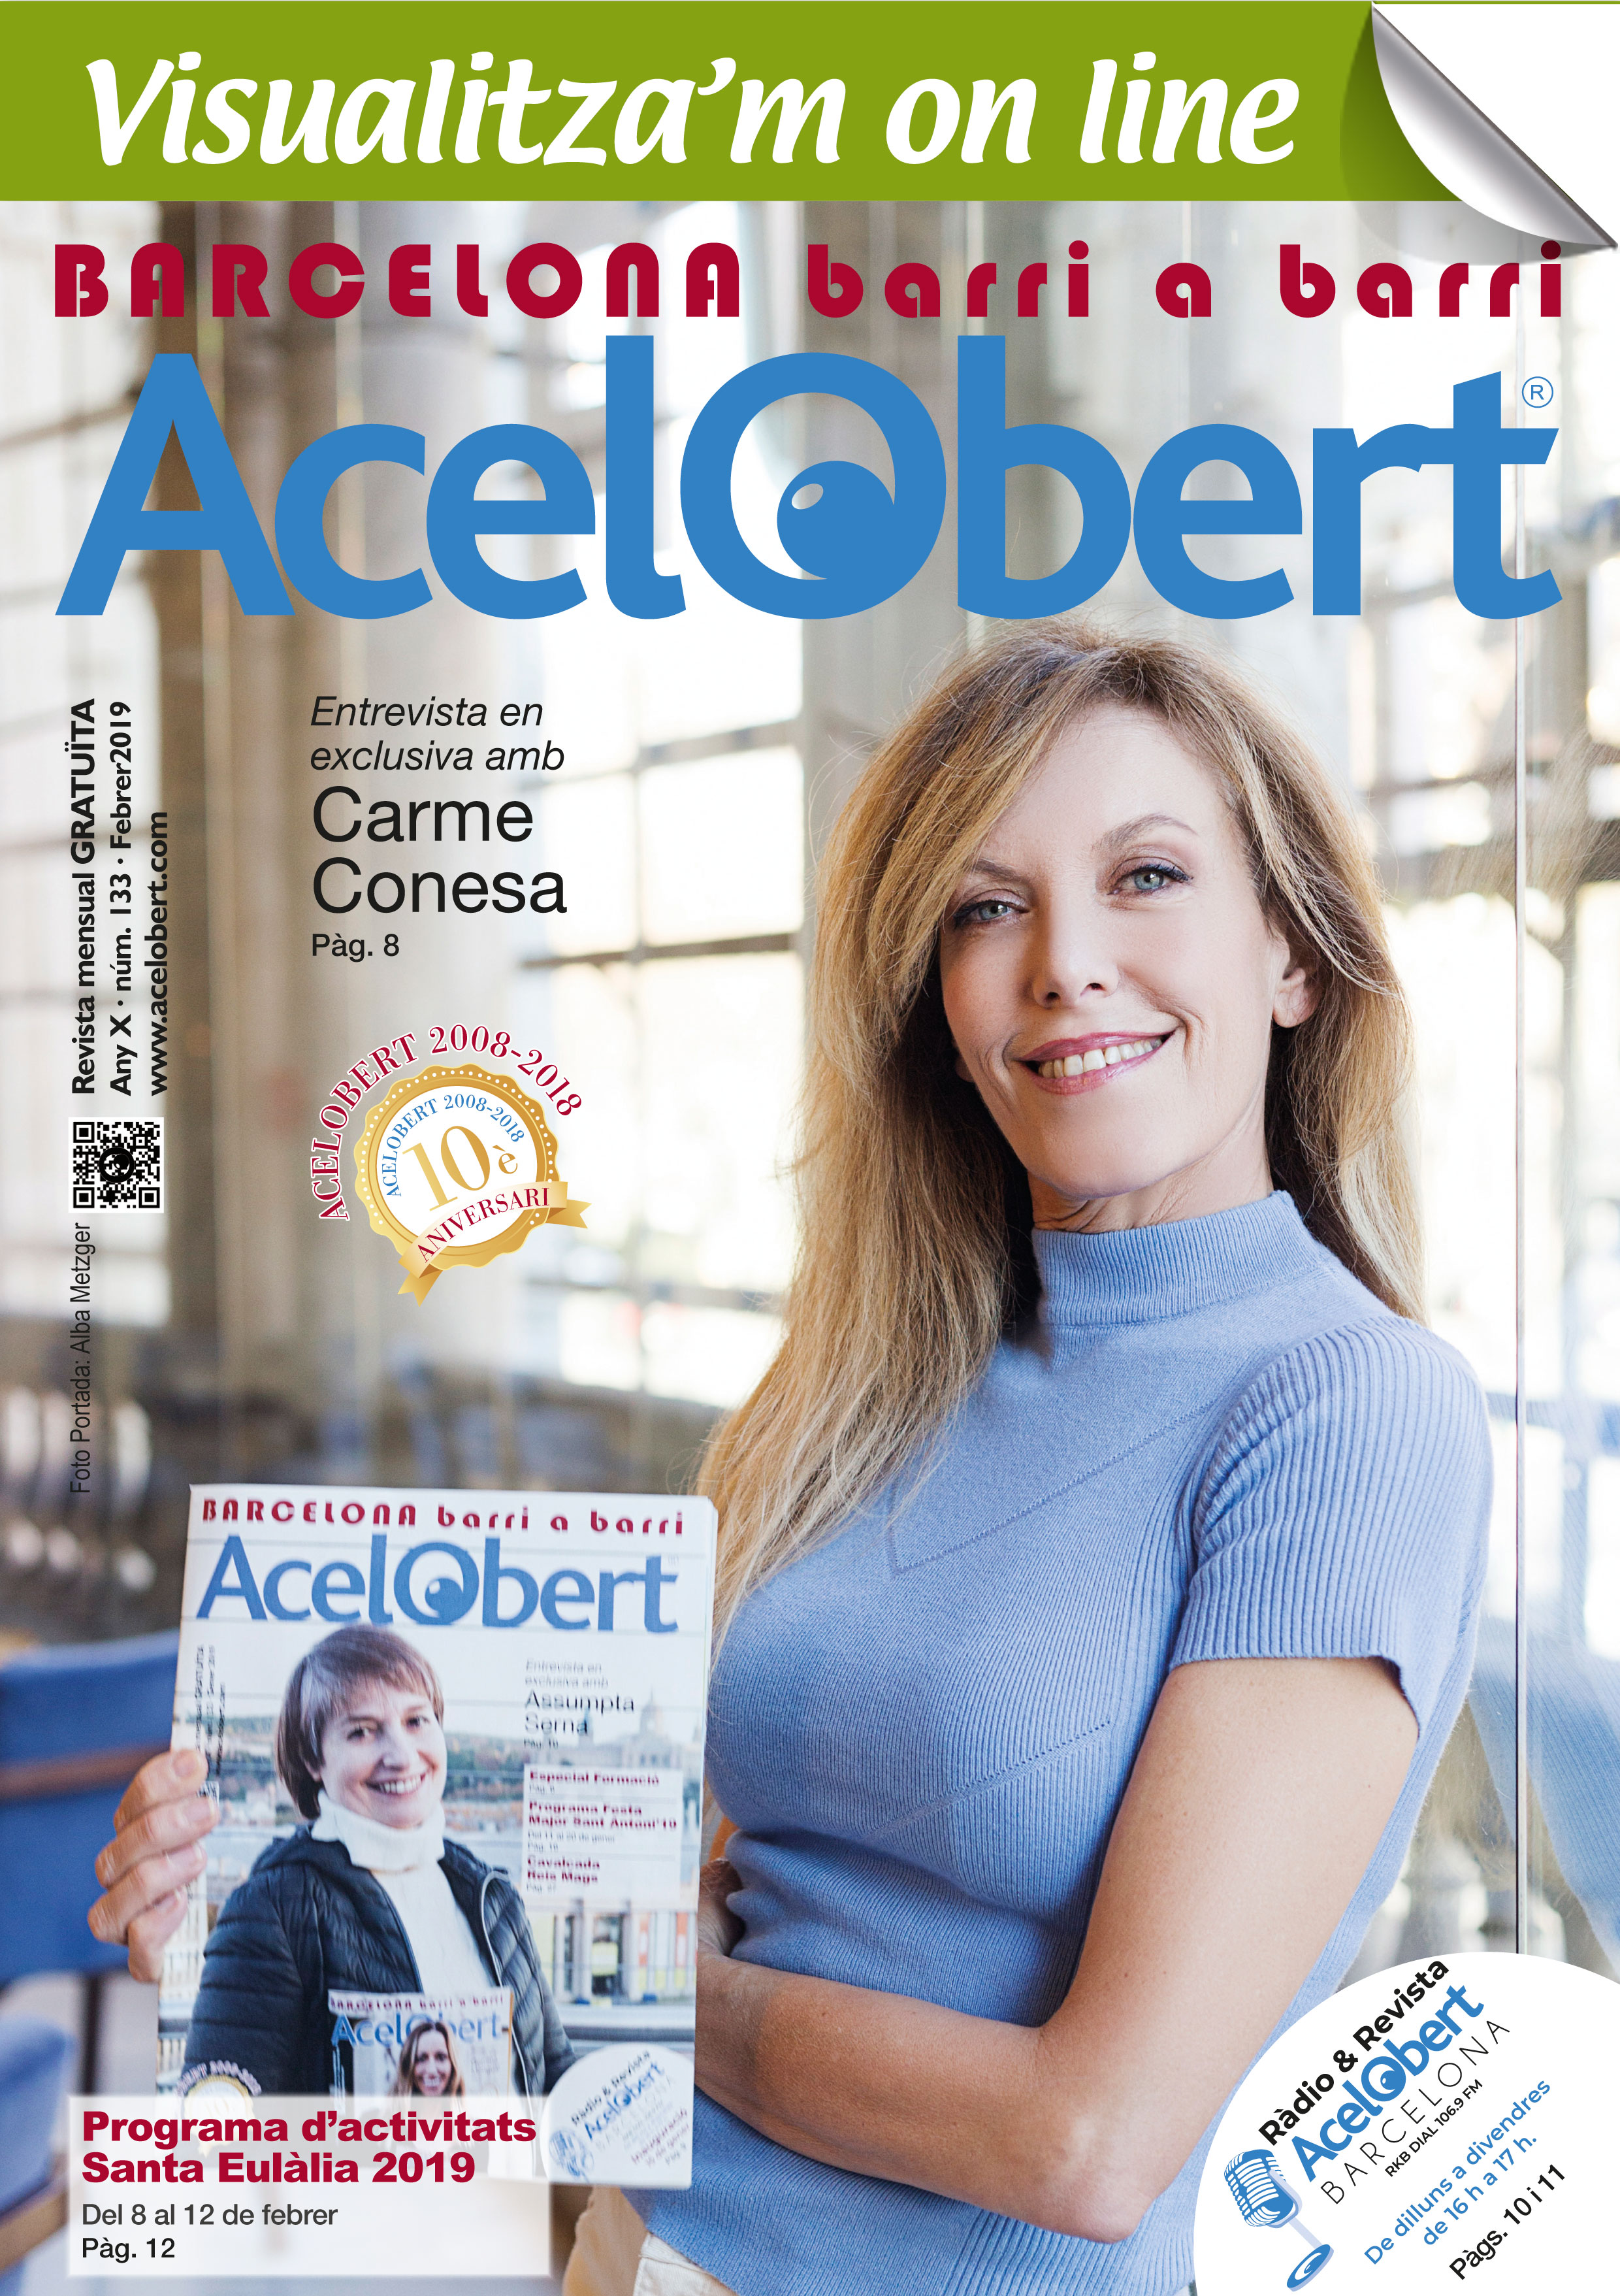 Acelobert Barcelona nº 133 FEBRER 2019